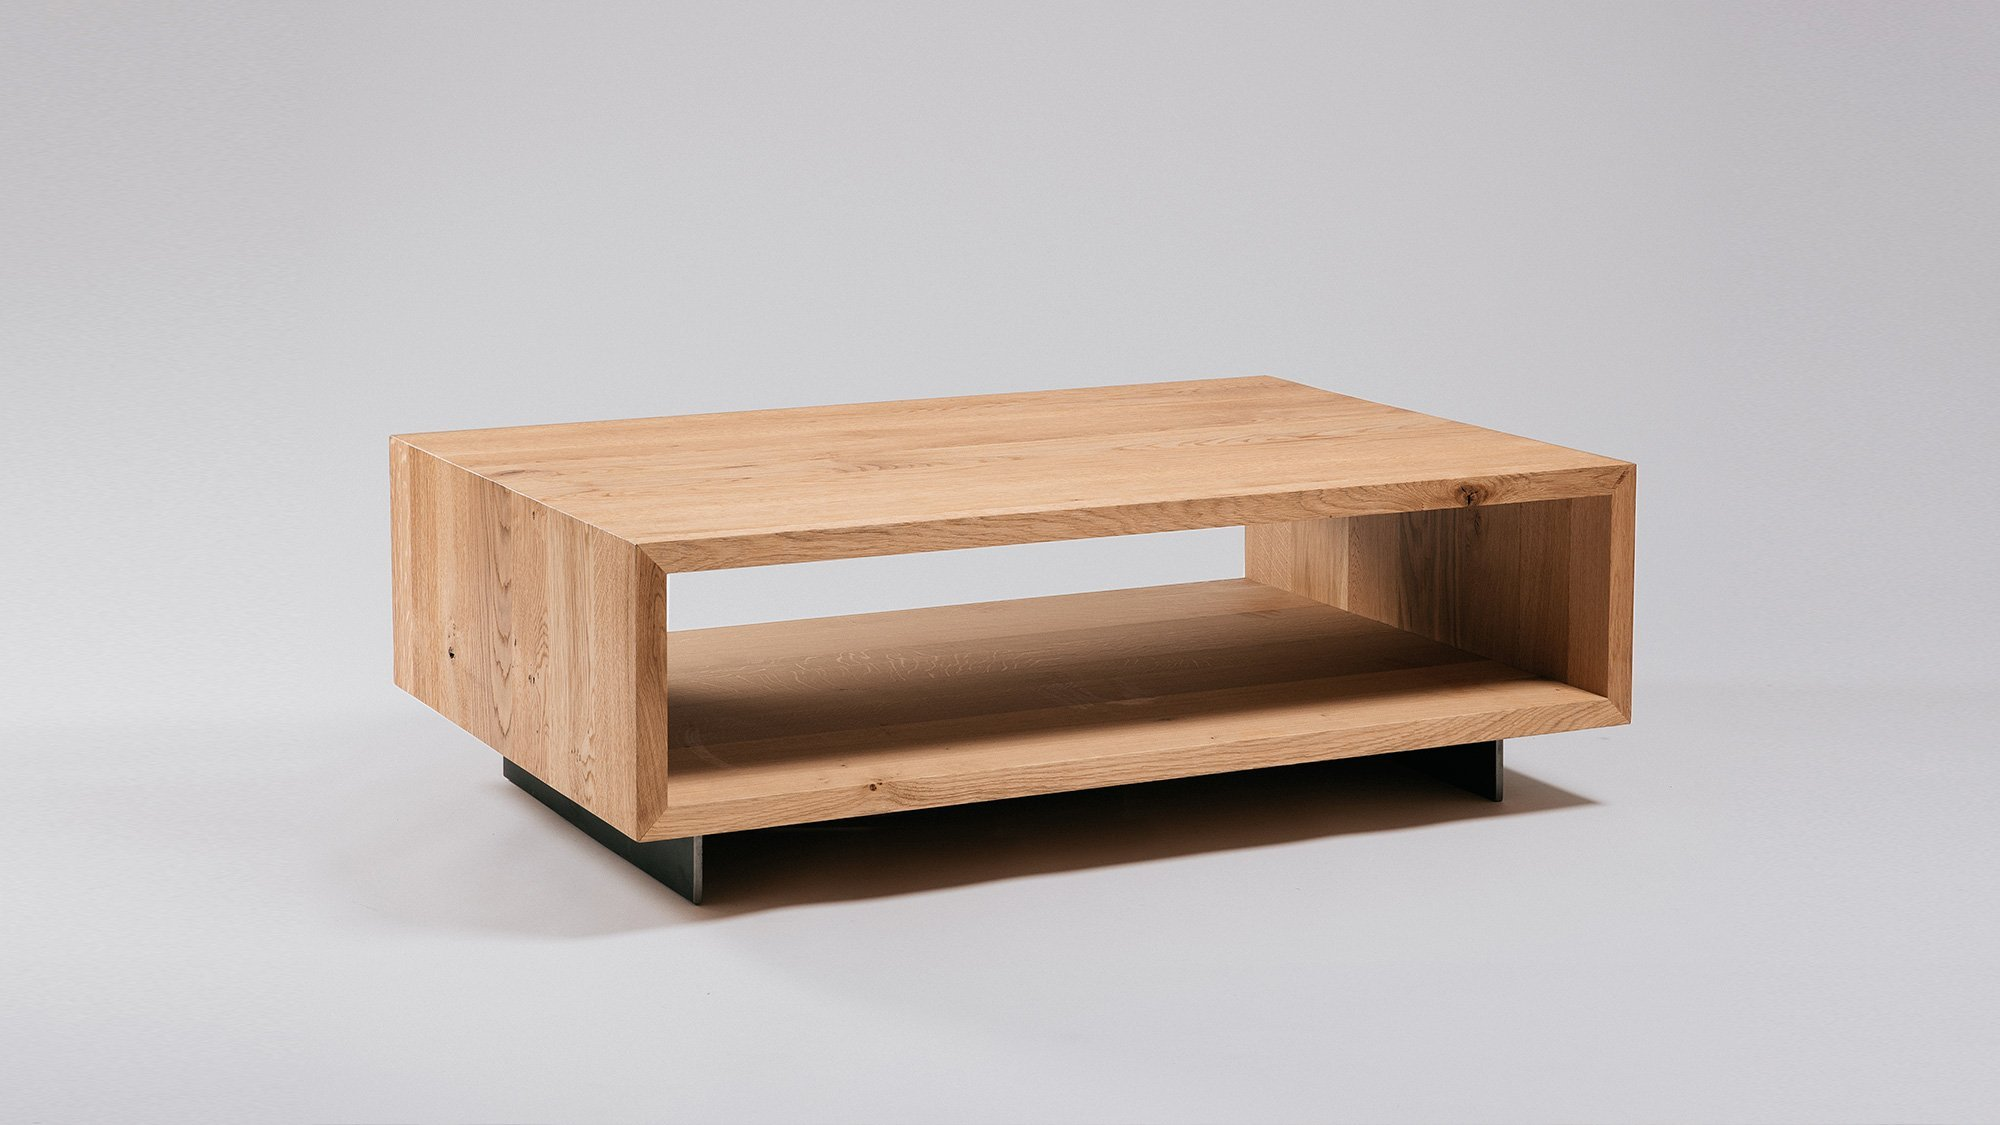 Muebles a medida muebles de dise o bois et fer - Muebles hierro y madera ...